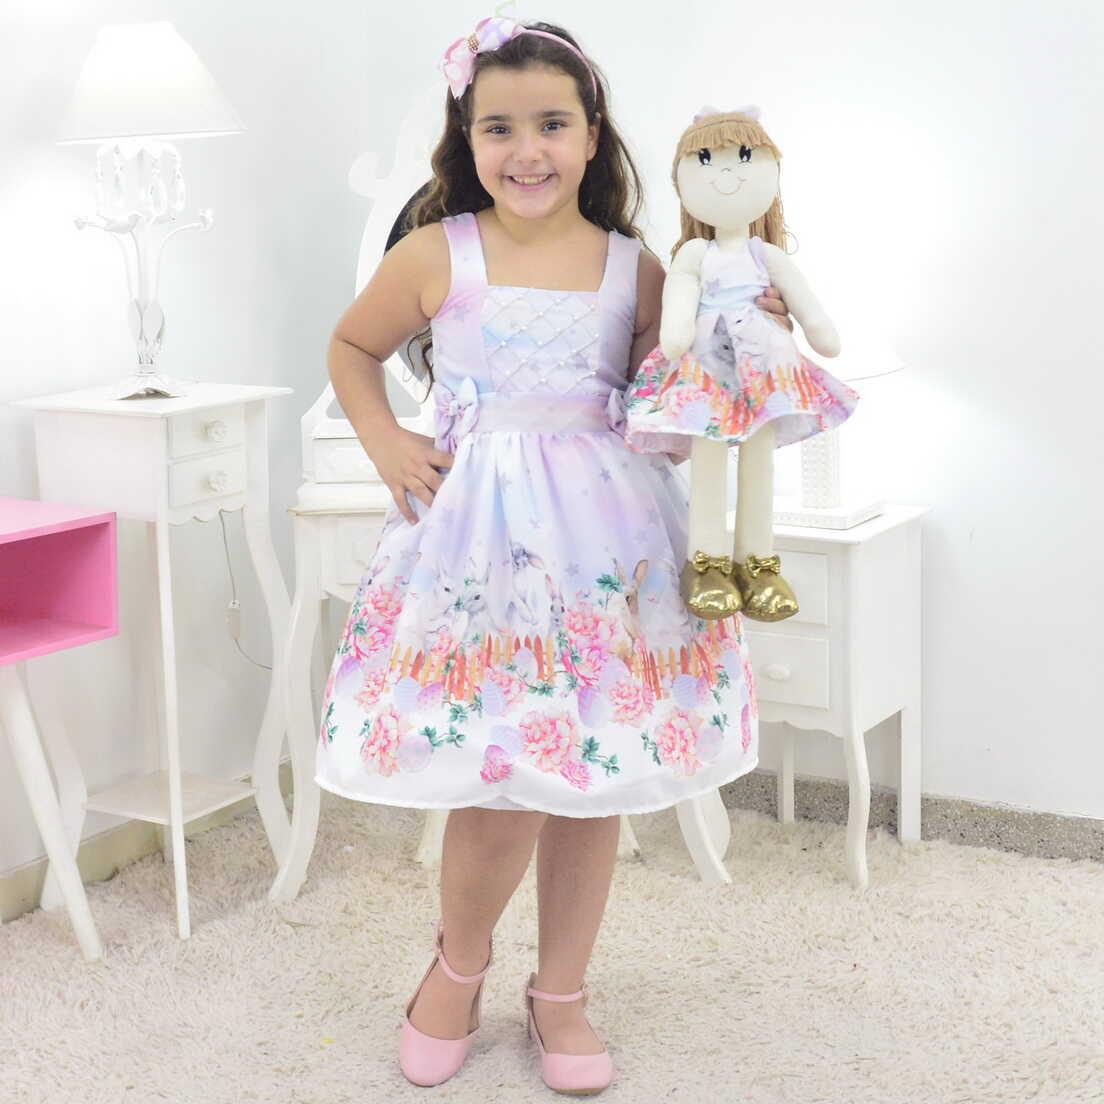 Tal Menina Tal Boneca Pri - Vestido de Pascoa com Coelhos